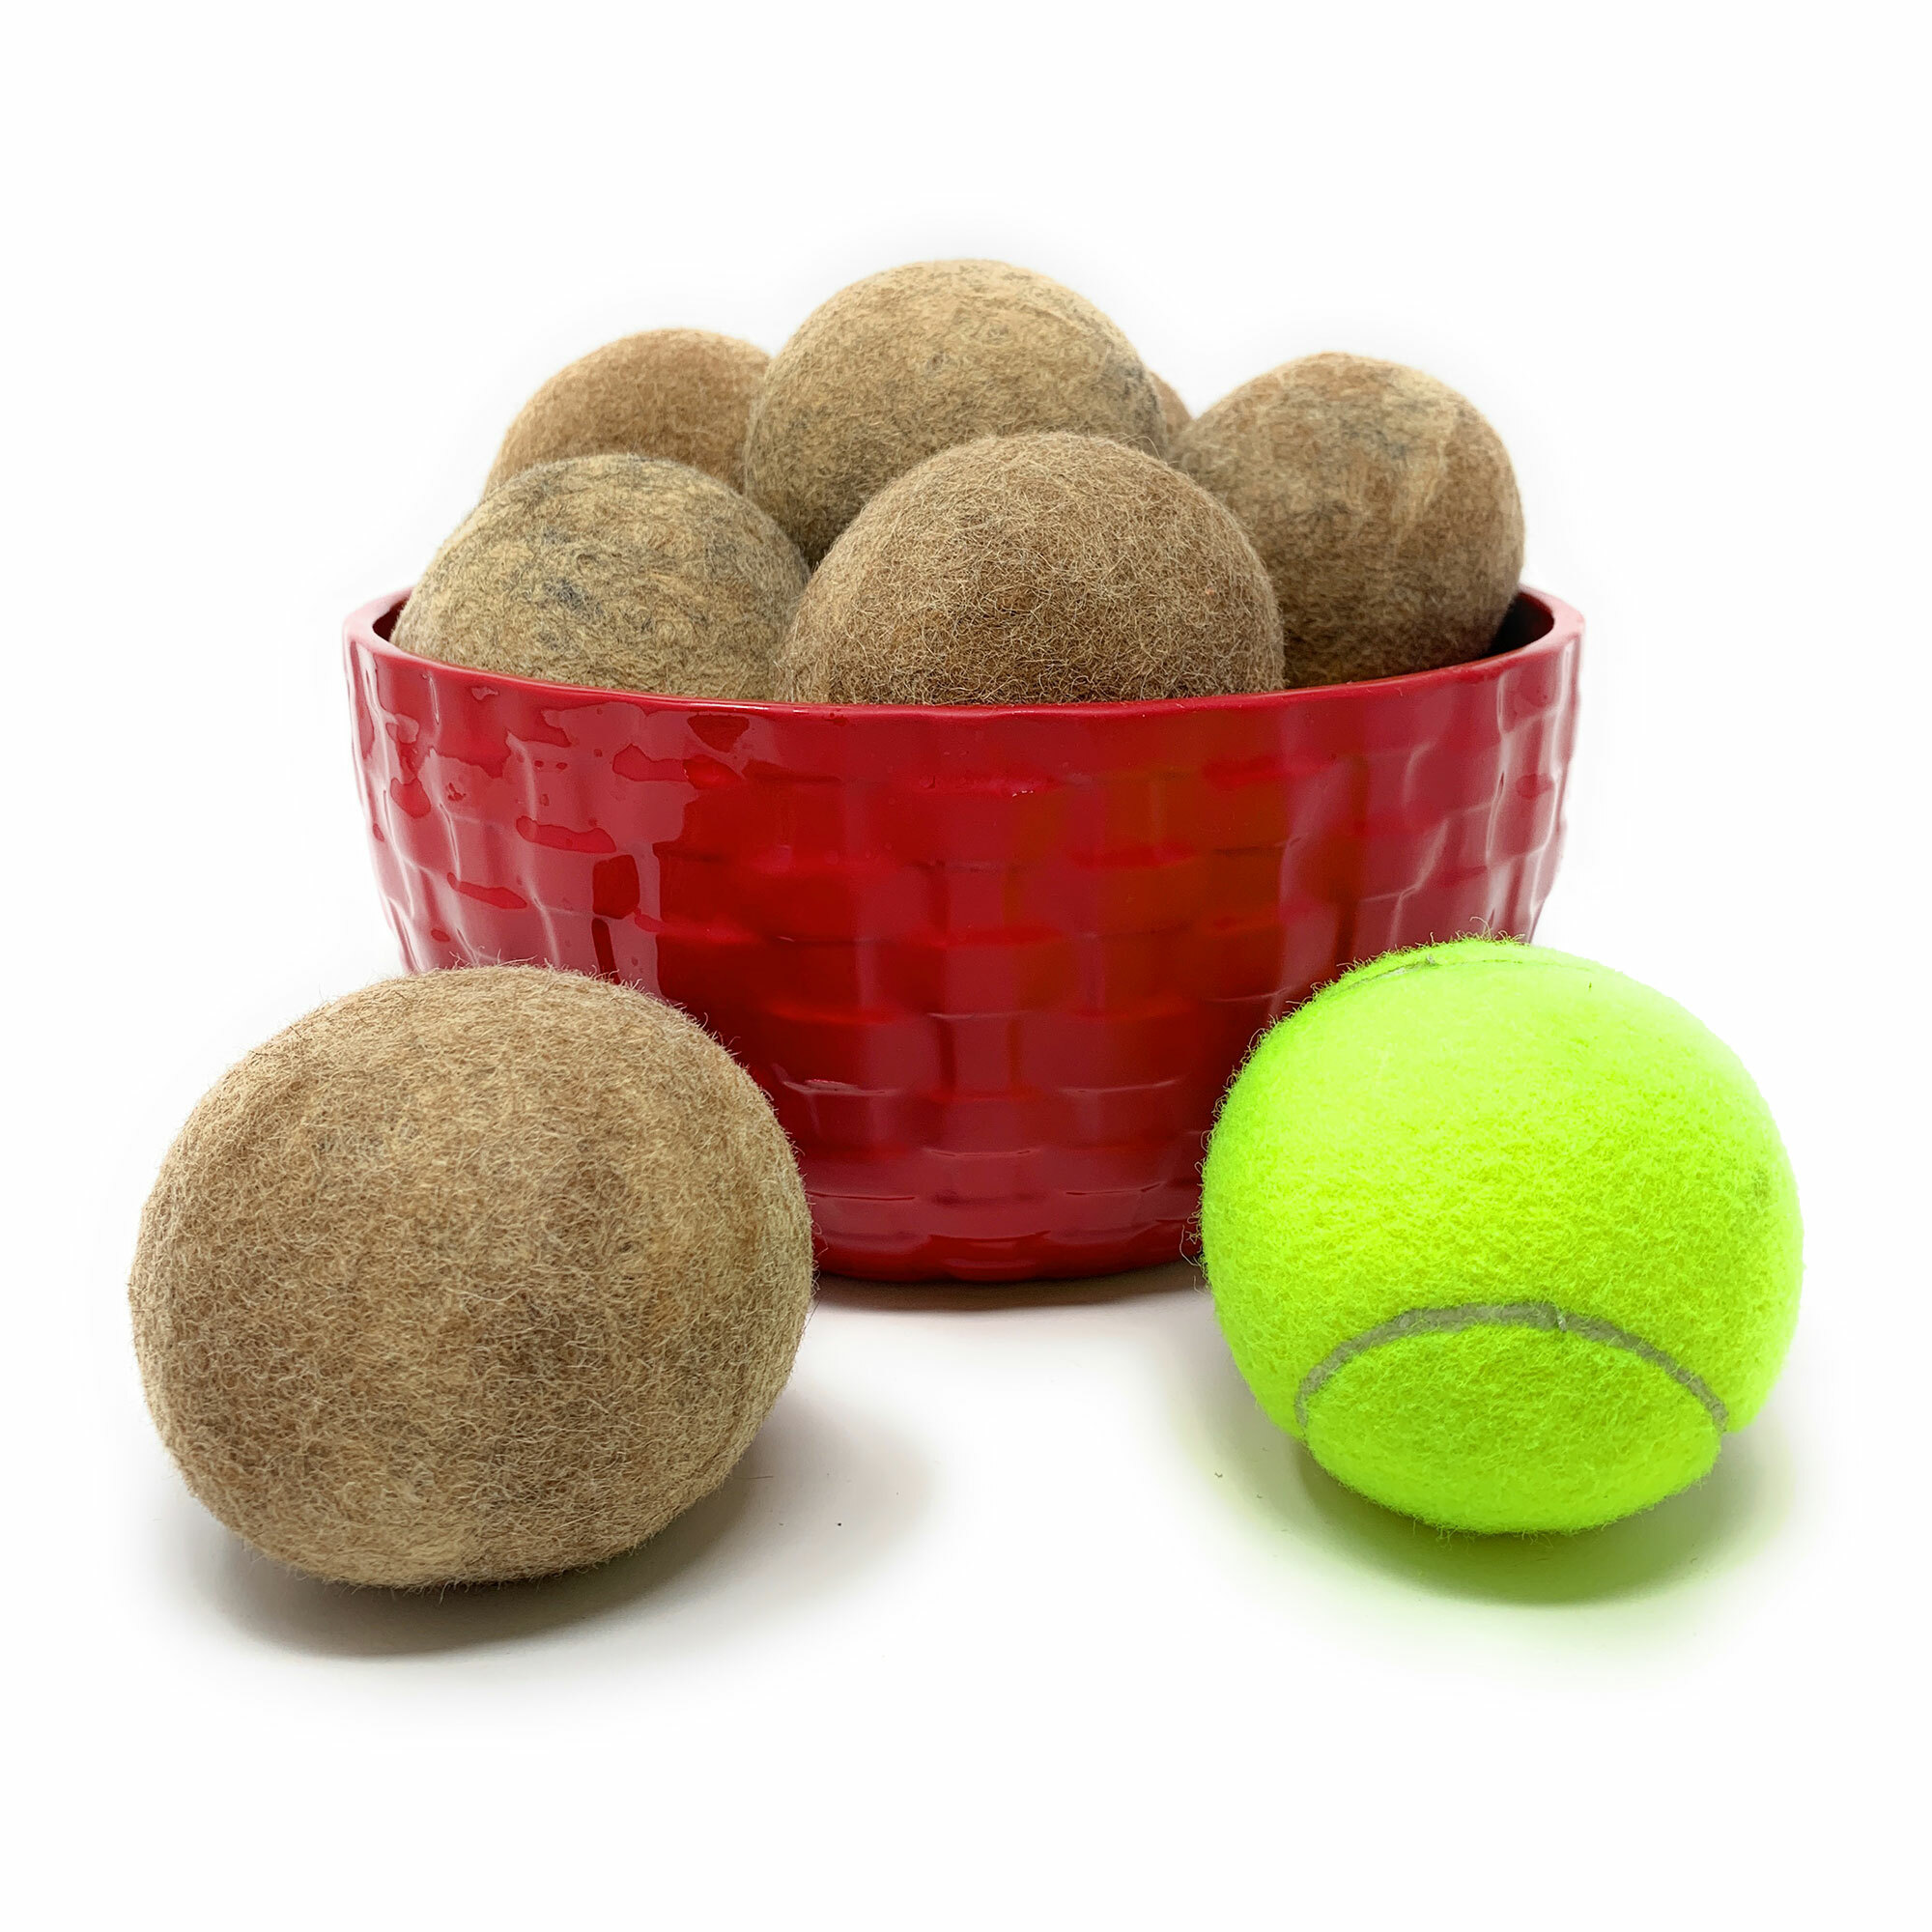 100% Alpaca Wool Dryer Balls -  Group